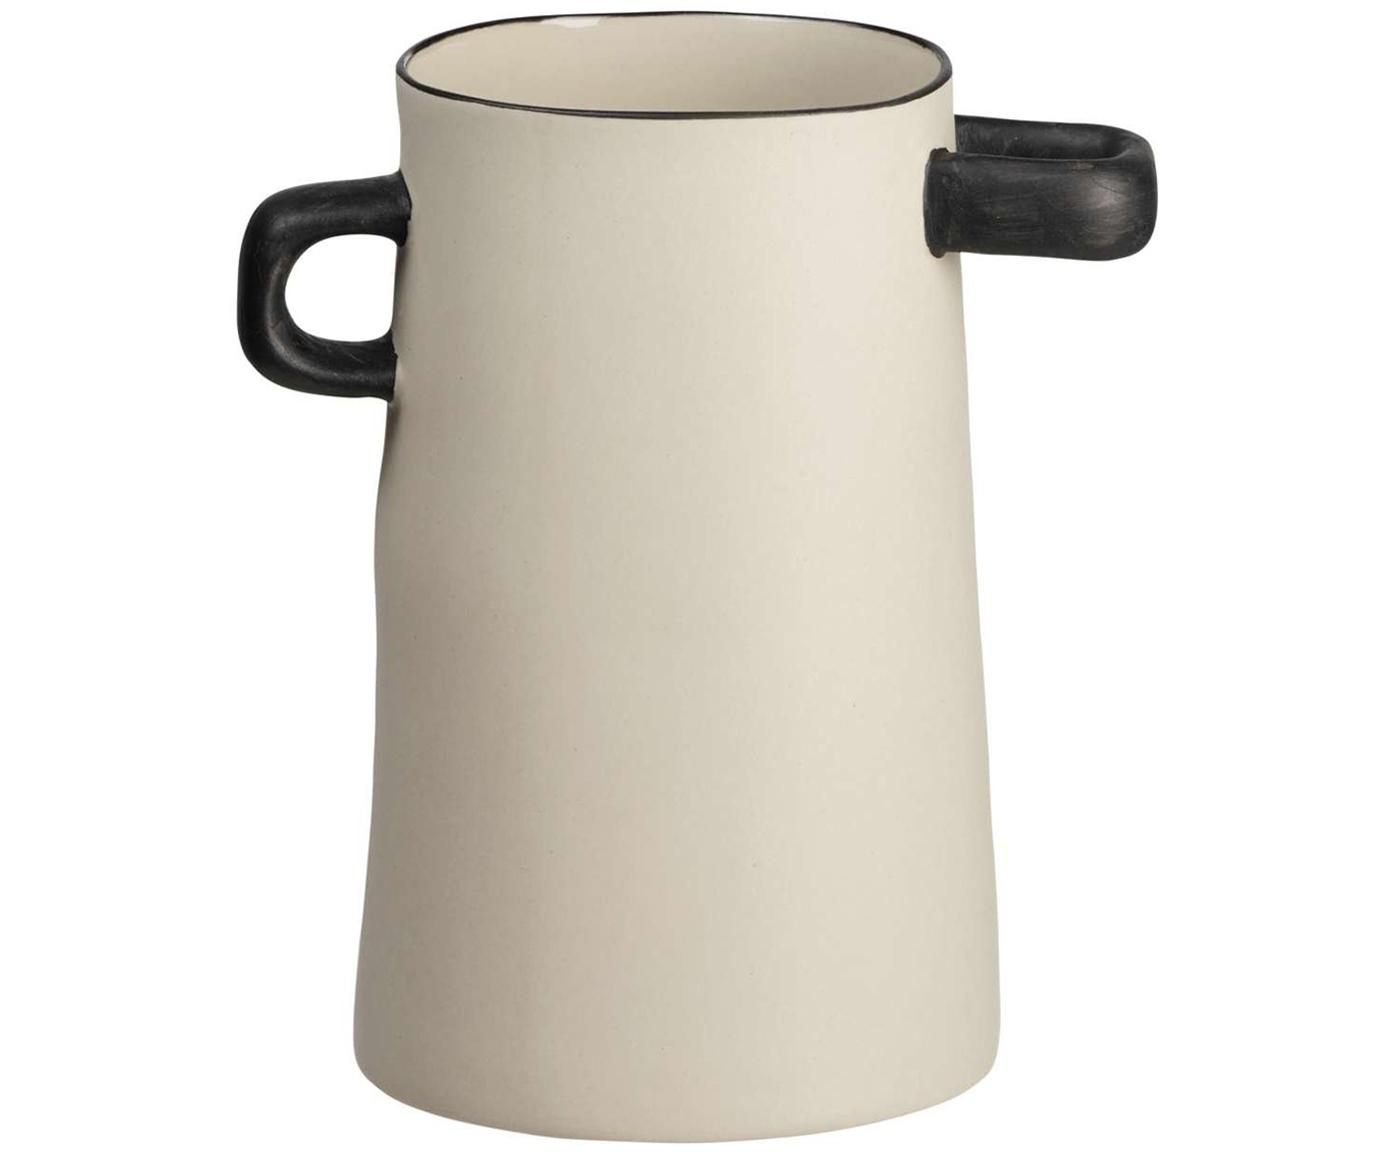 Vaso in gres fatto a mano Rayu, Terracotta, Beige, nero, Ø 11 x Alt. 17 cm